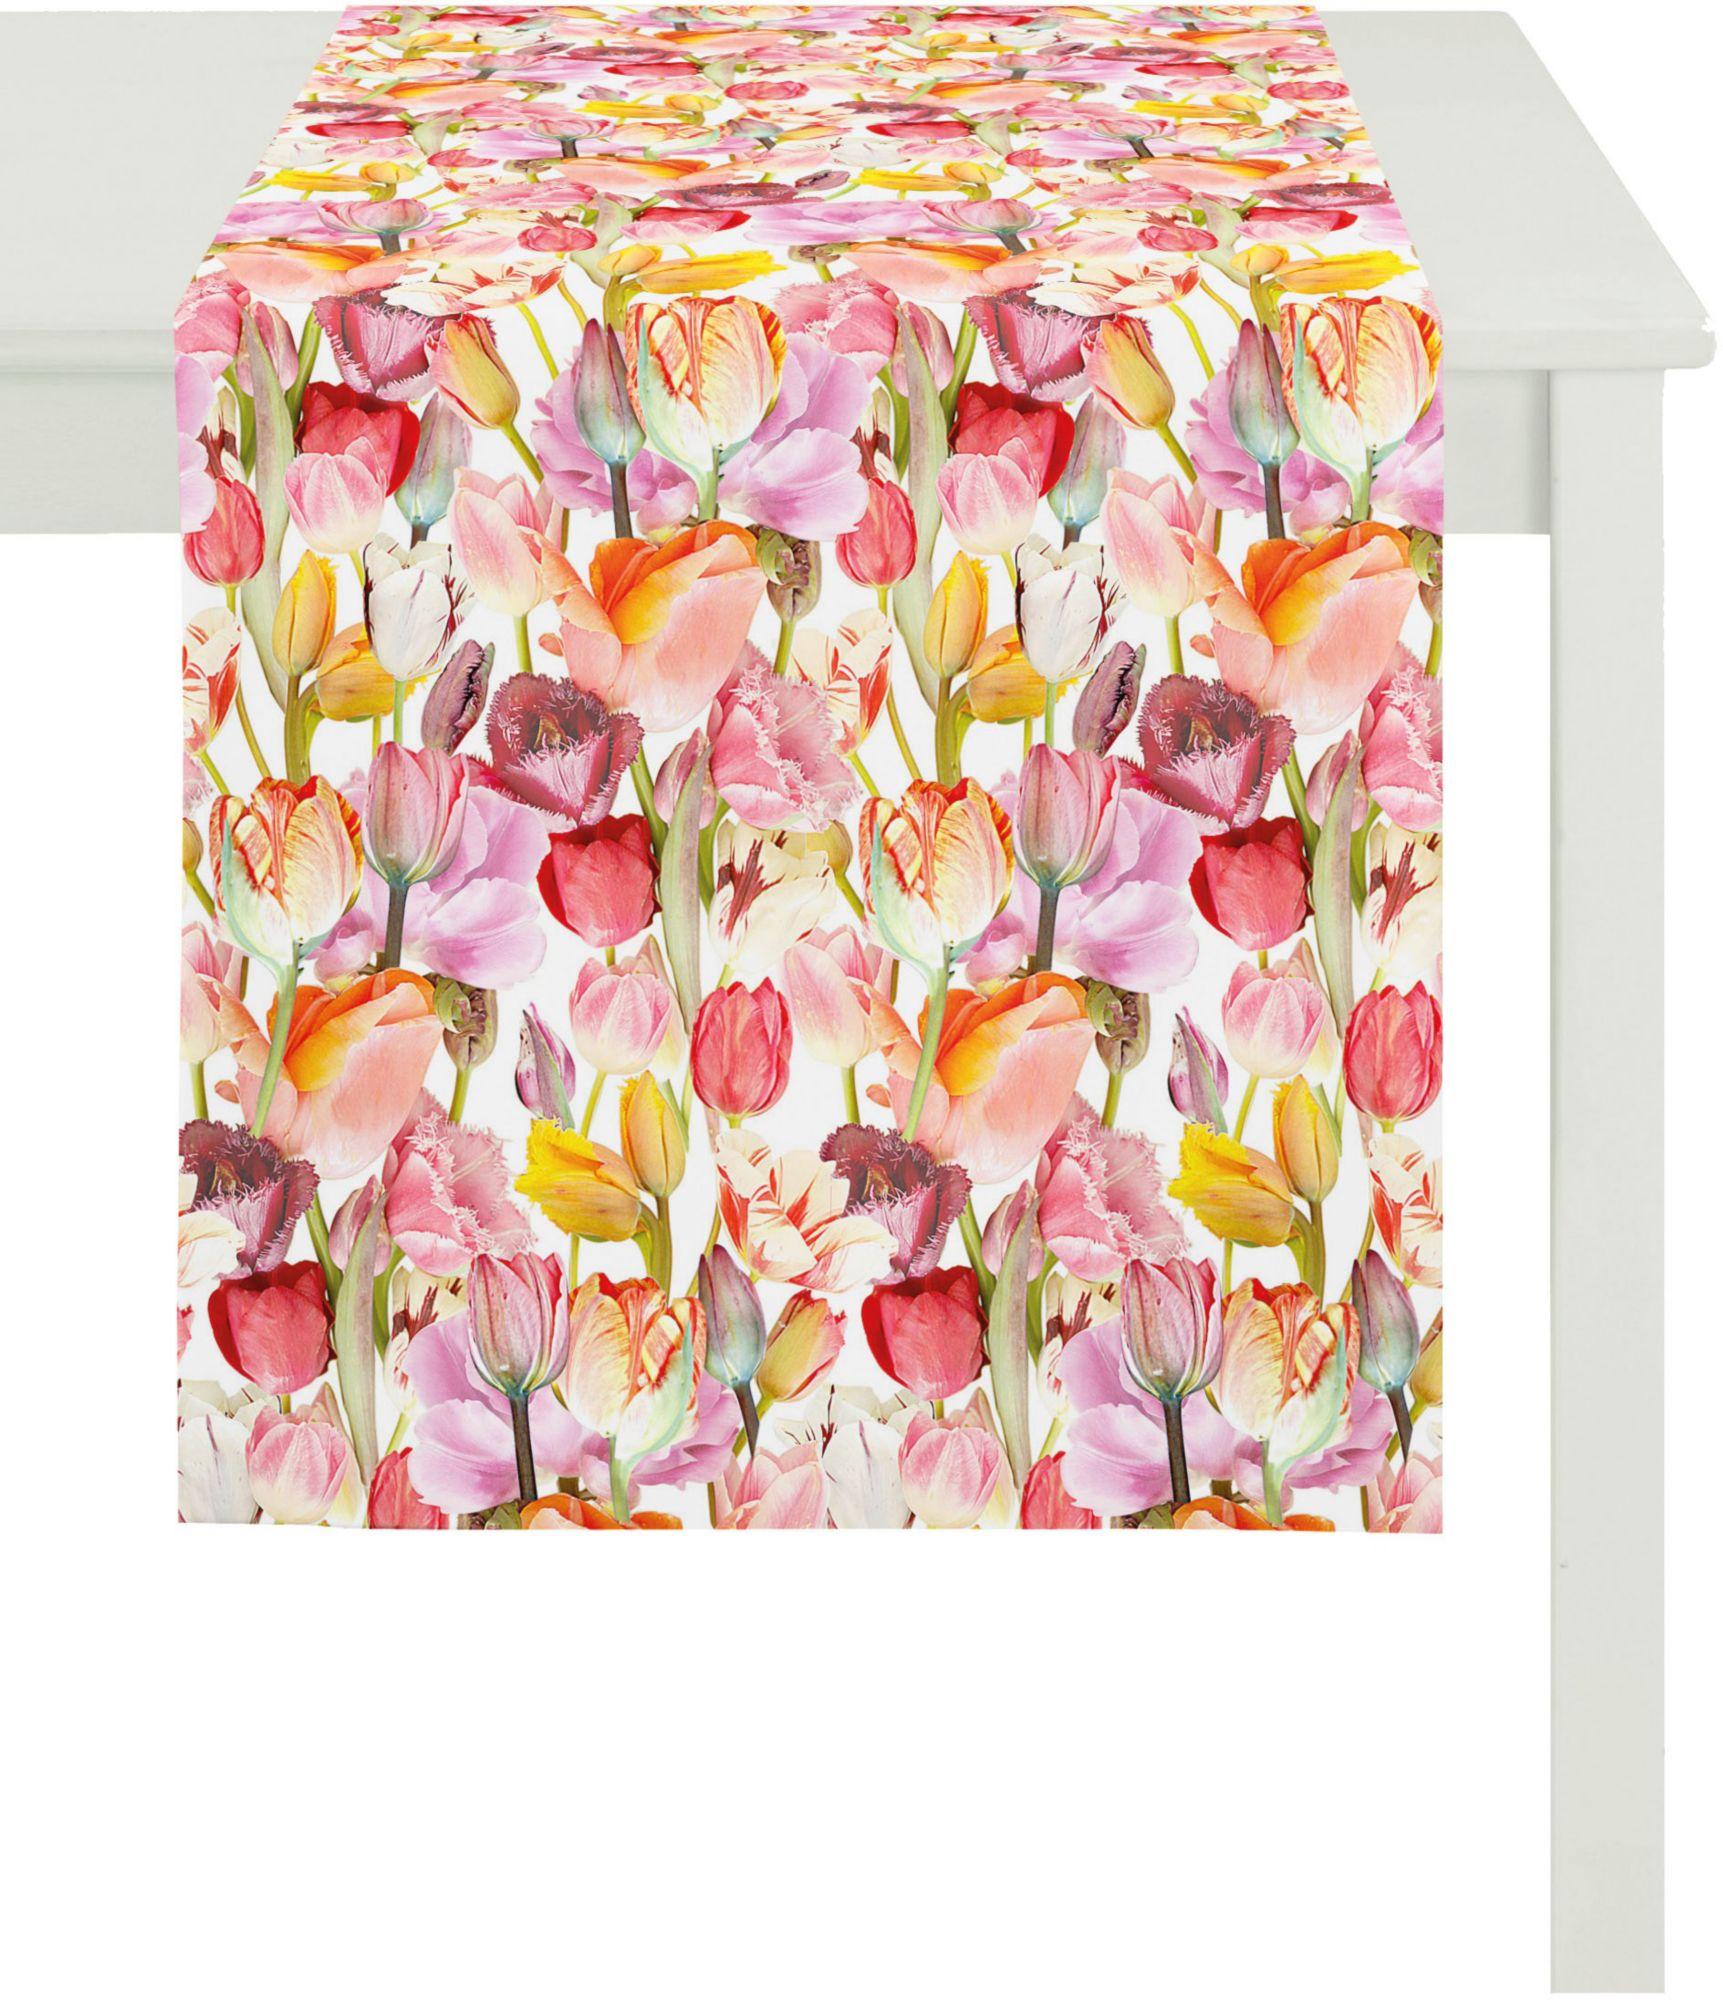 APELT Apelt Tischläufer, 48x140 cm, »2212 SPRINGTIME«